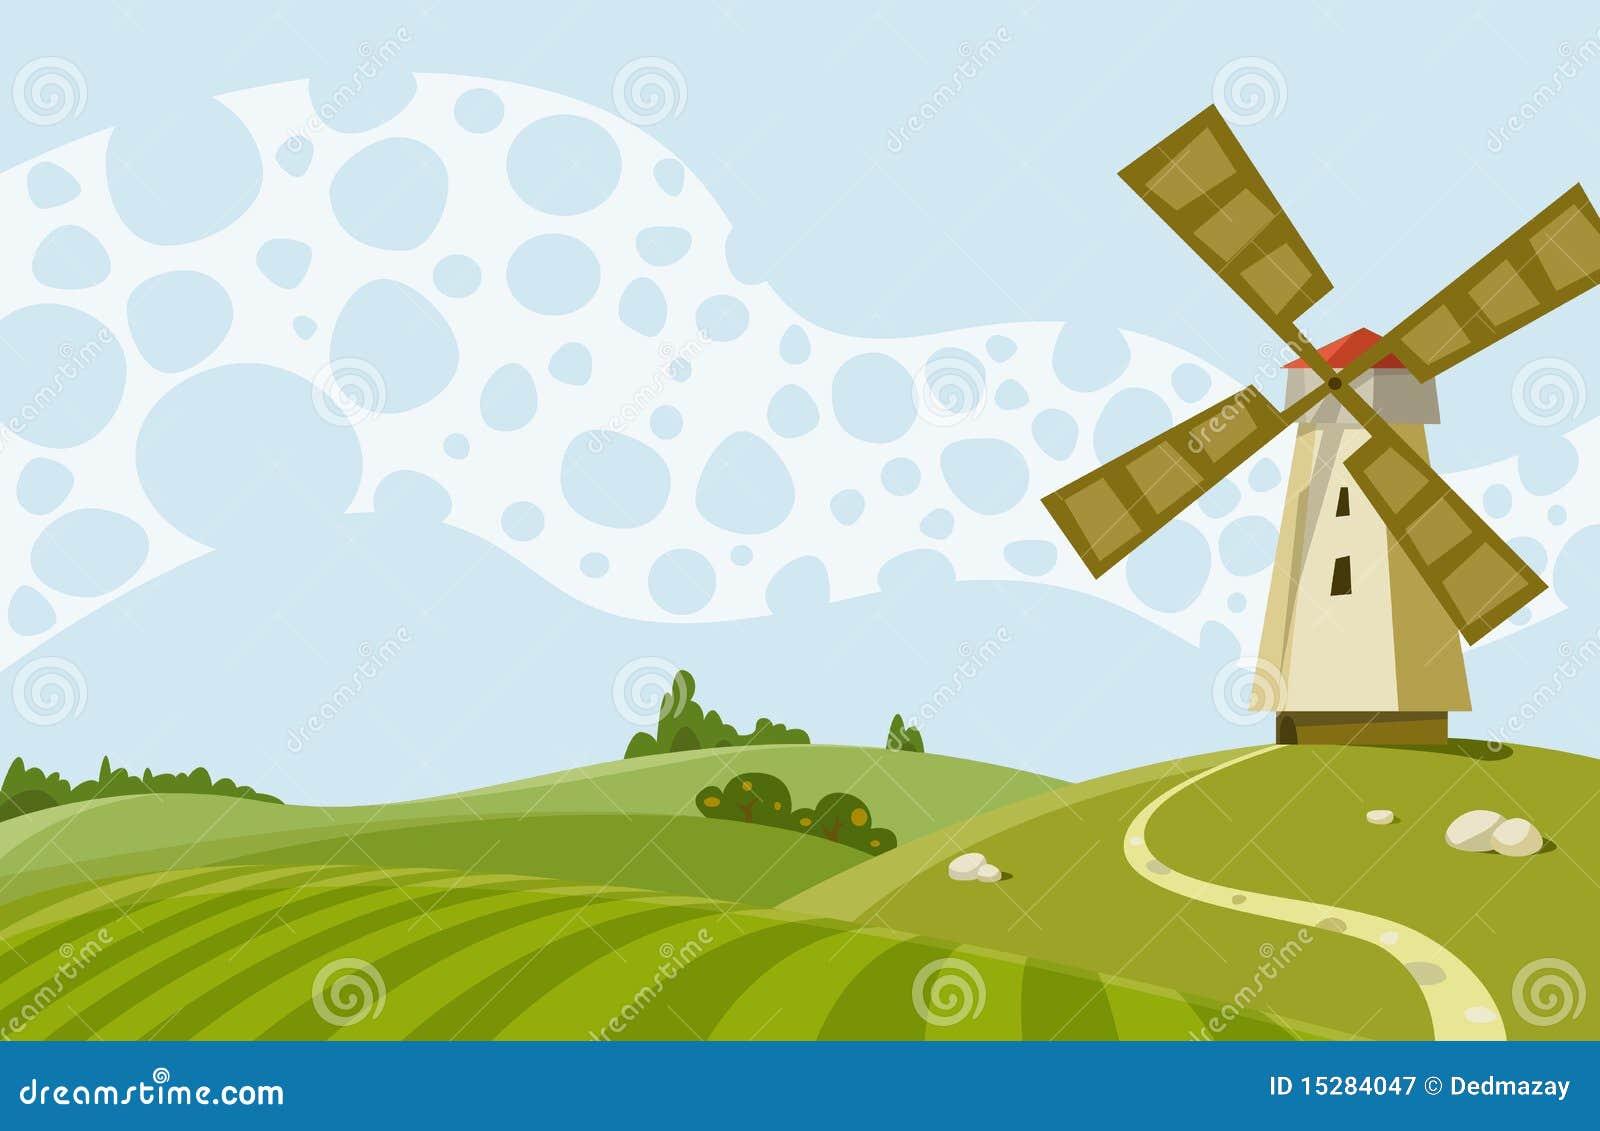 windmill cartoons  illustrations  u0026 vector stock images